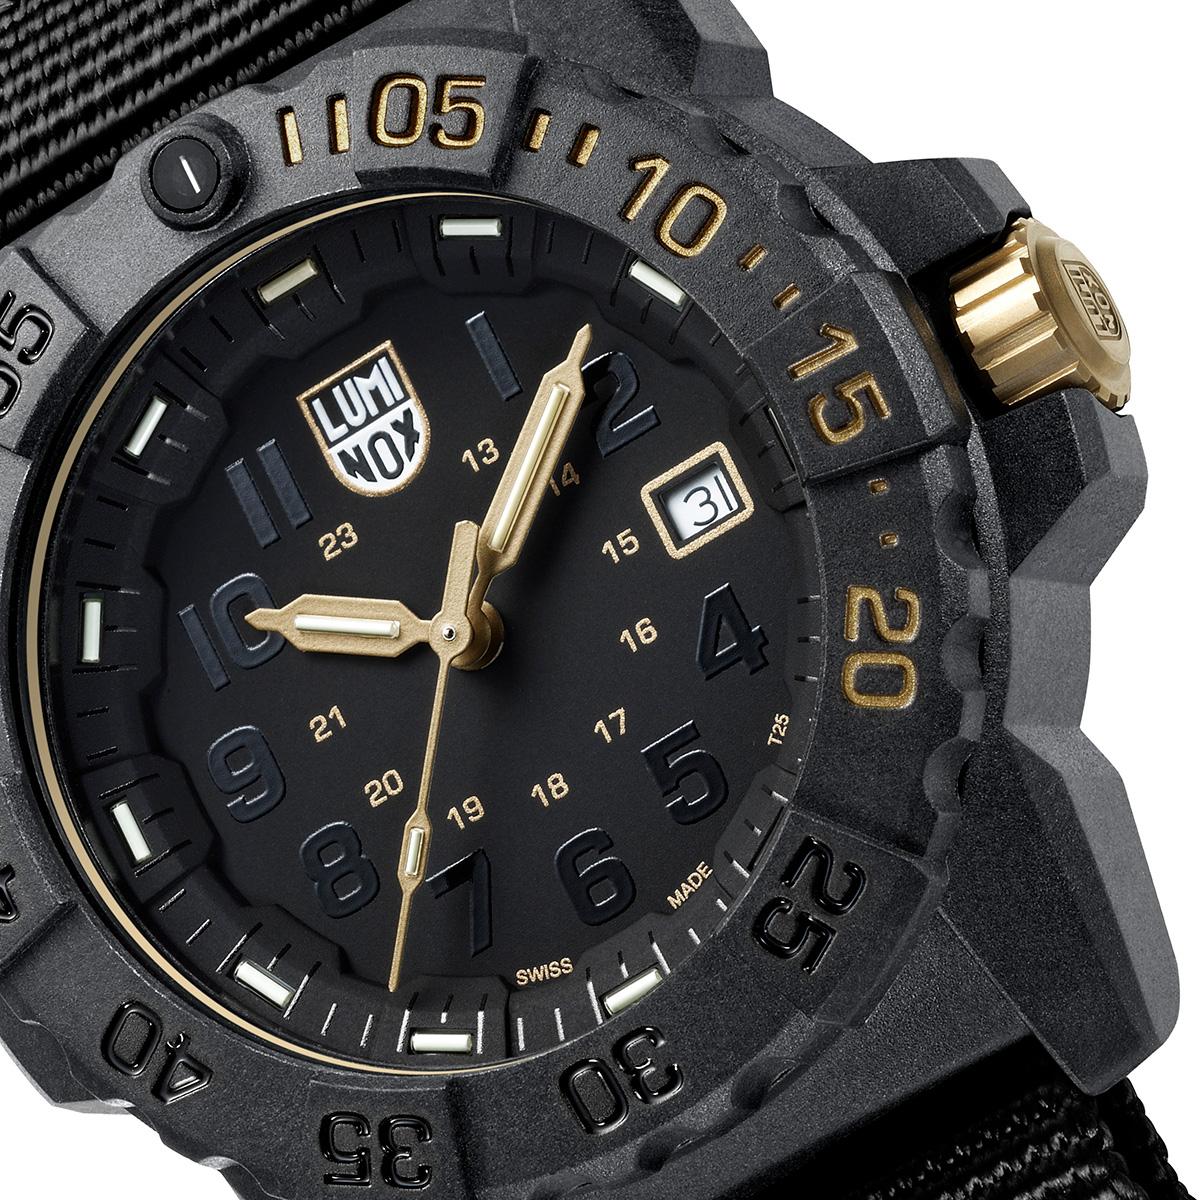 https://luminox.jp/watch-collection/sea/navy-seal-3500-series-ref-3501-gold-set/